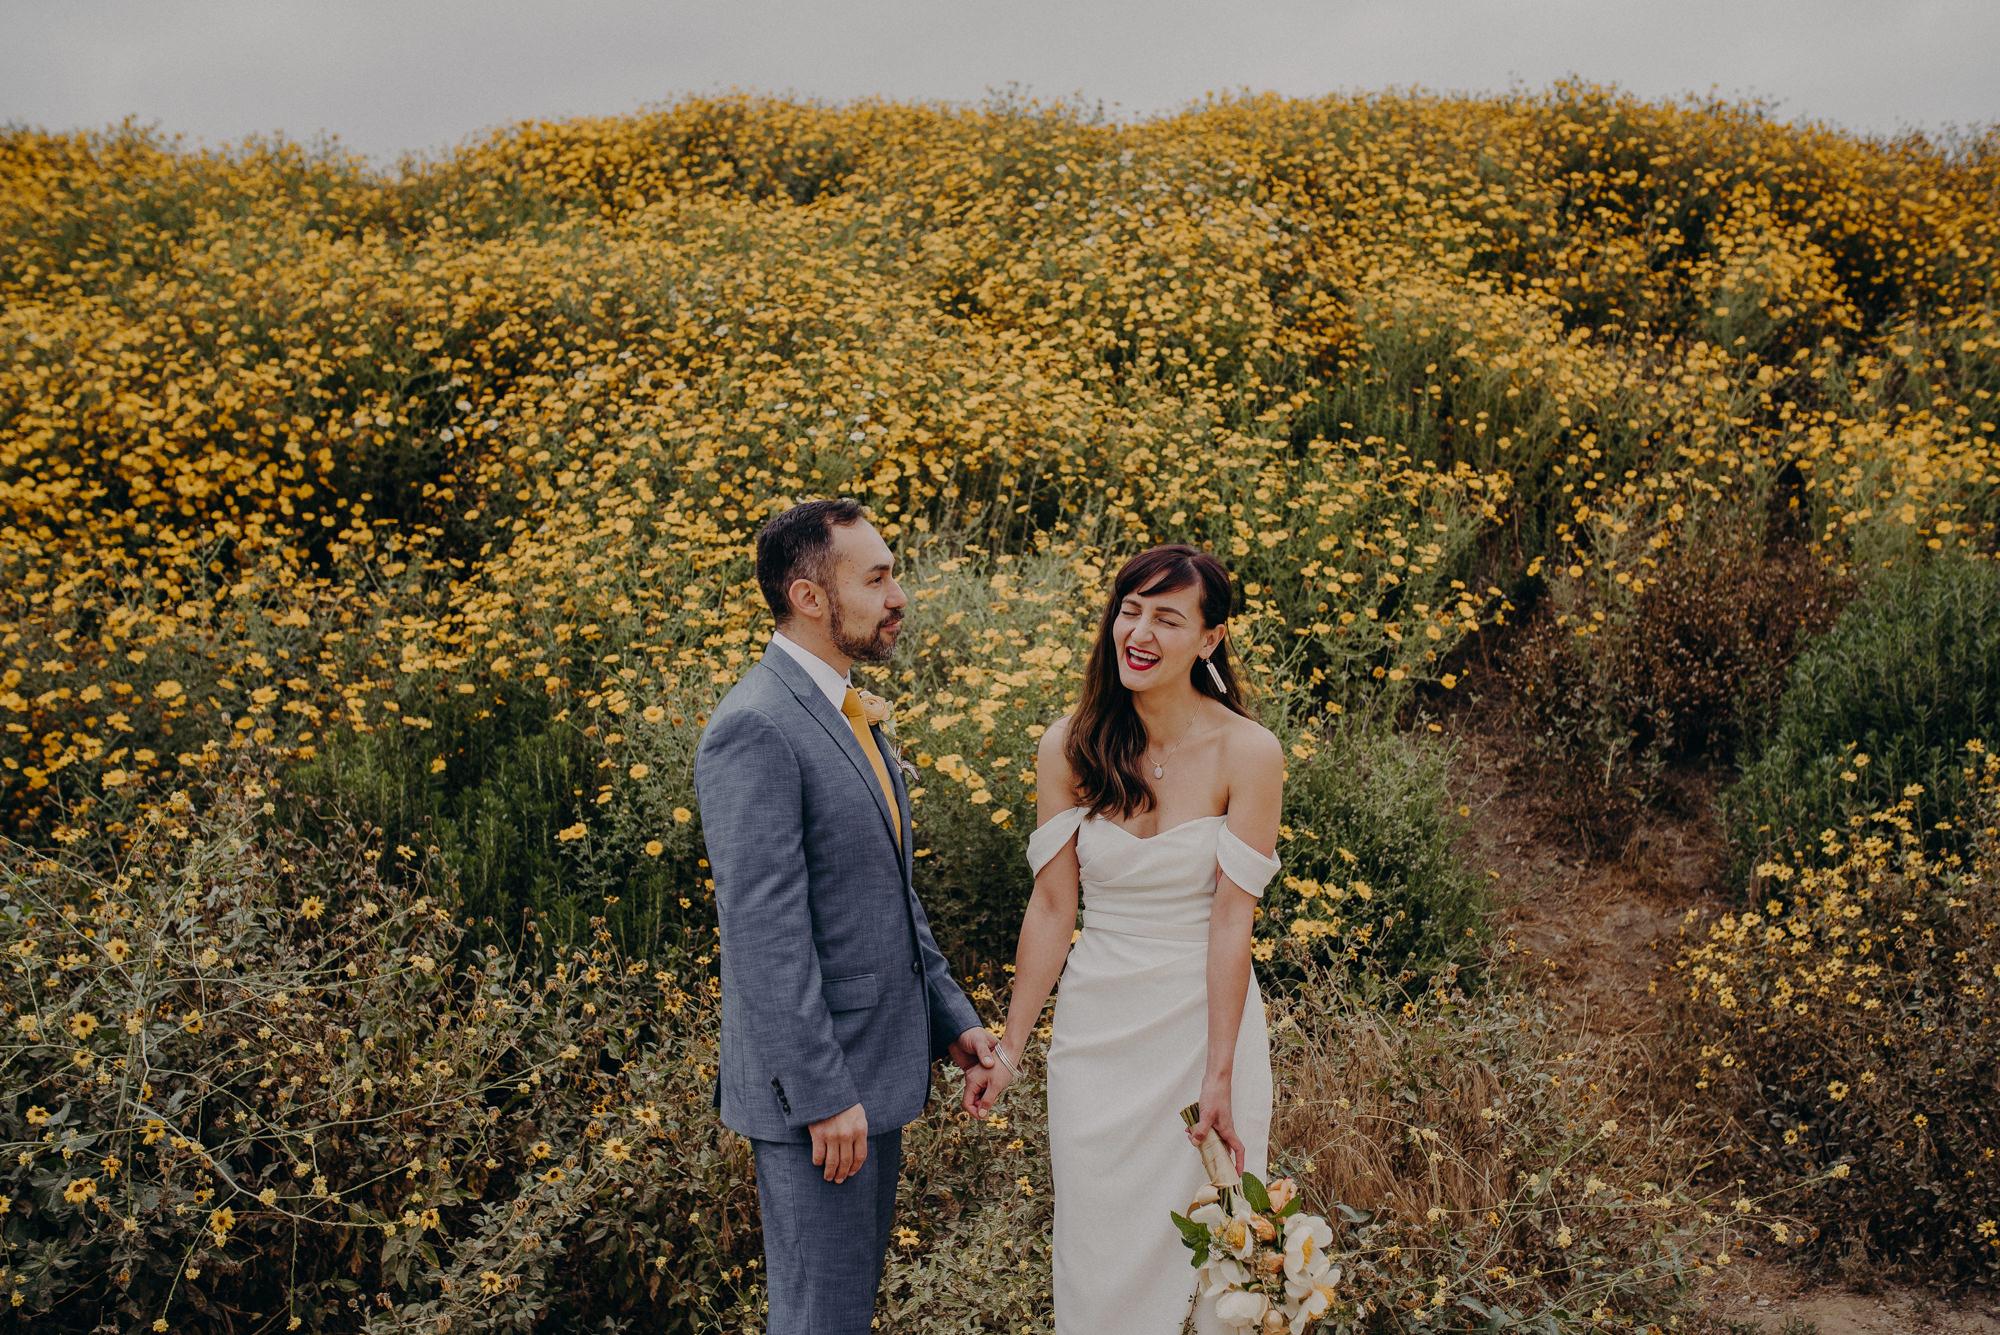 elopement photographer in los angeles - la wedding photographer - isaiahandtaylor.com-019.jpg